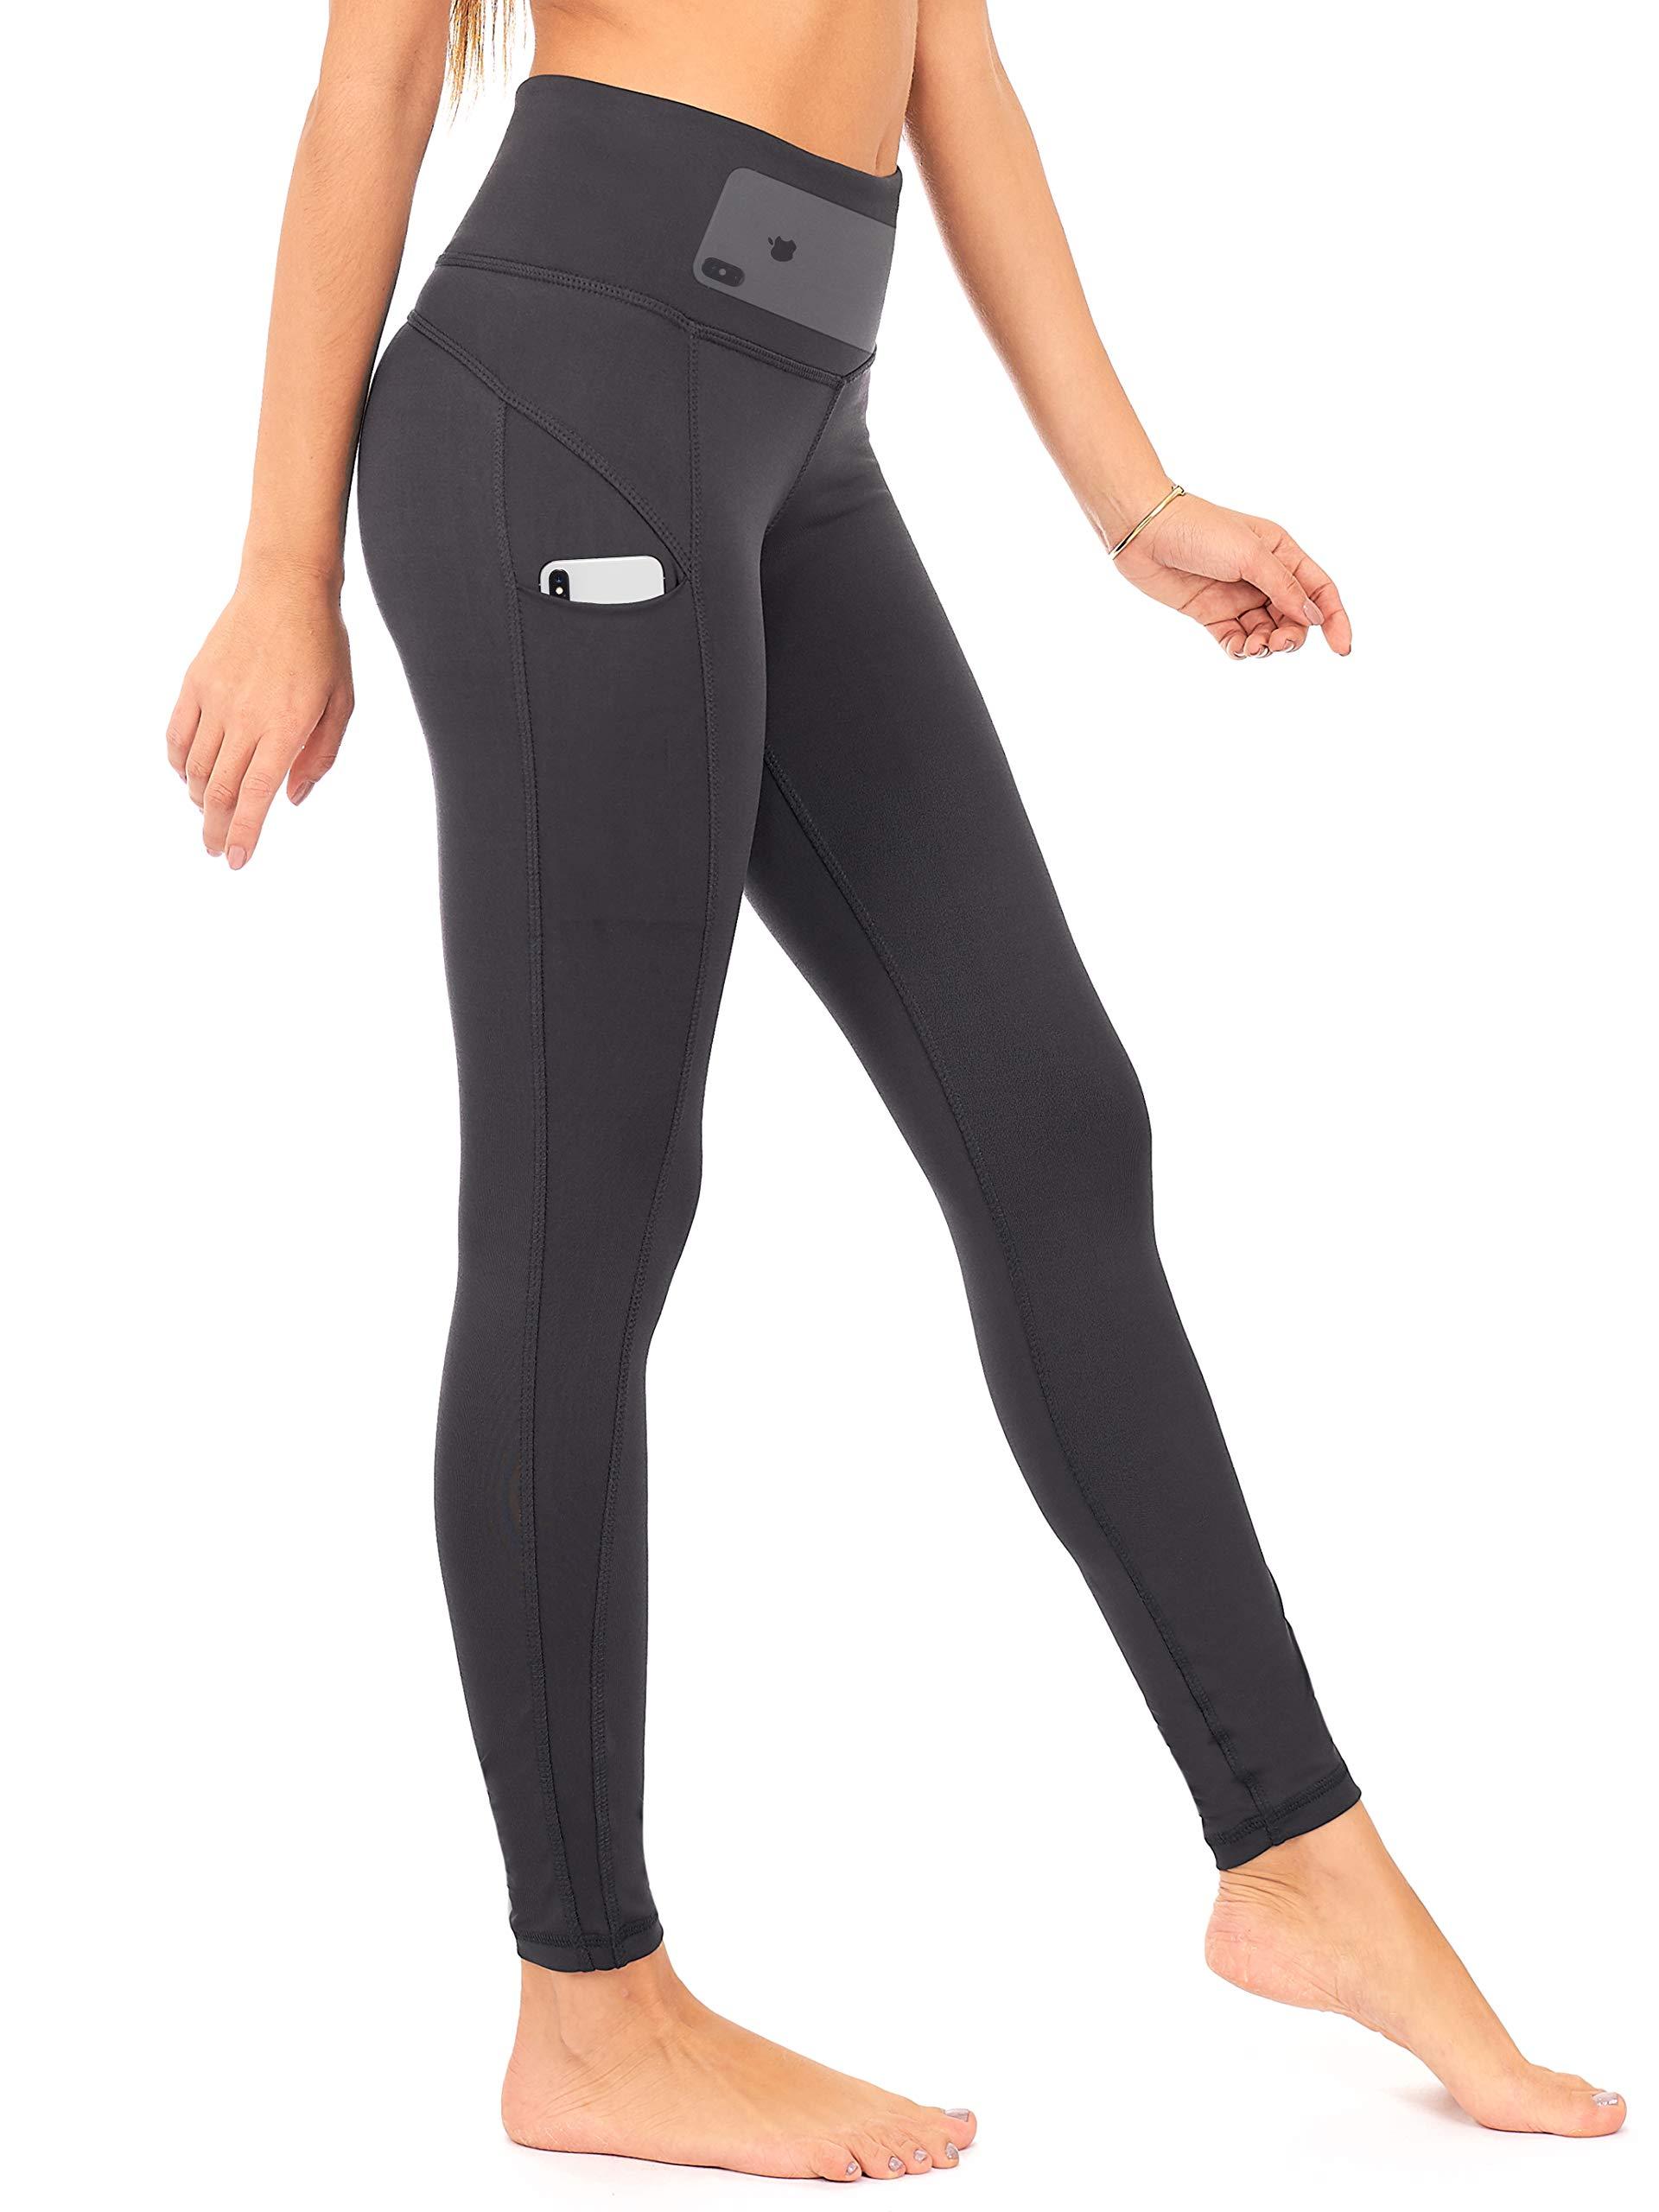 DEAR SPARKLE High Waist Workout Leggings with 3 Pockets for Women. Yoga Athletic Legging for Women (S1)